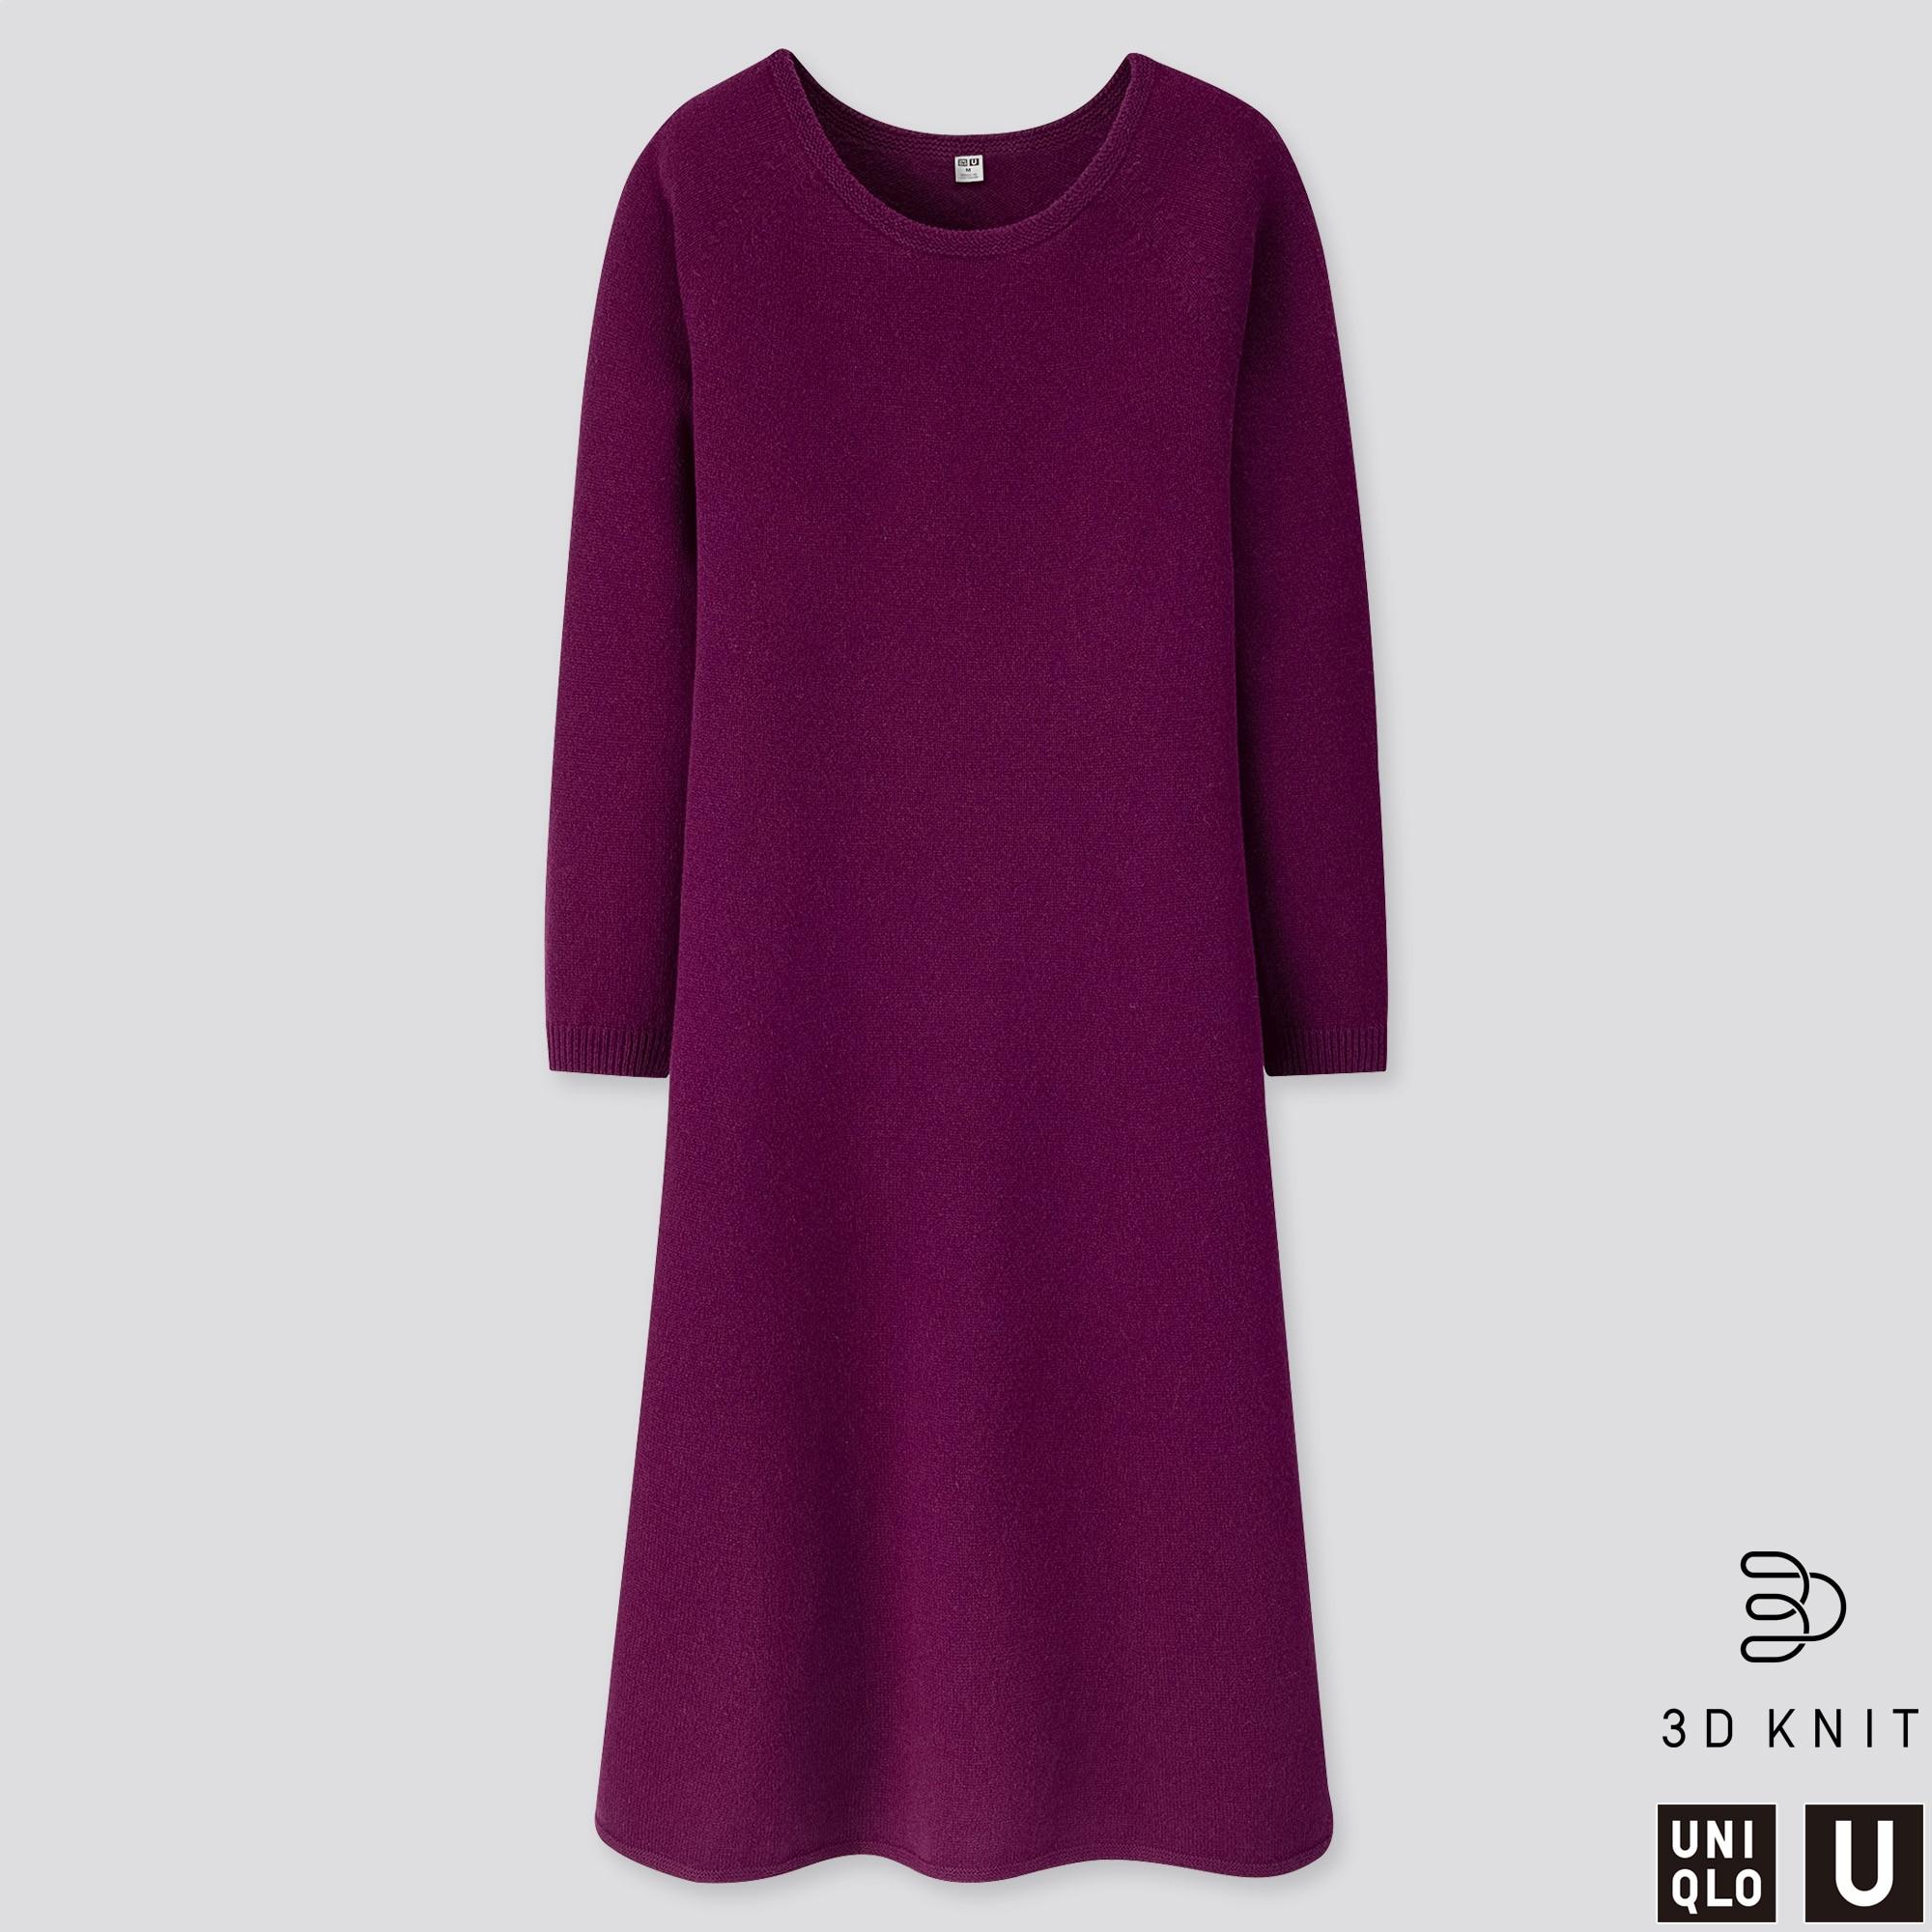 WOMEN U 3D PREMIUM LAMBSWOOL FLARED LONG-SLEEVE DRESS